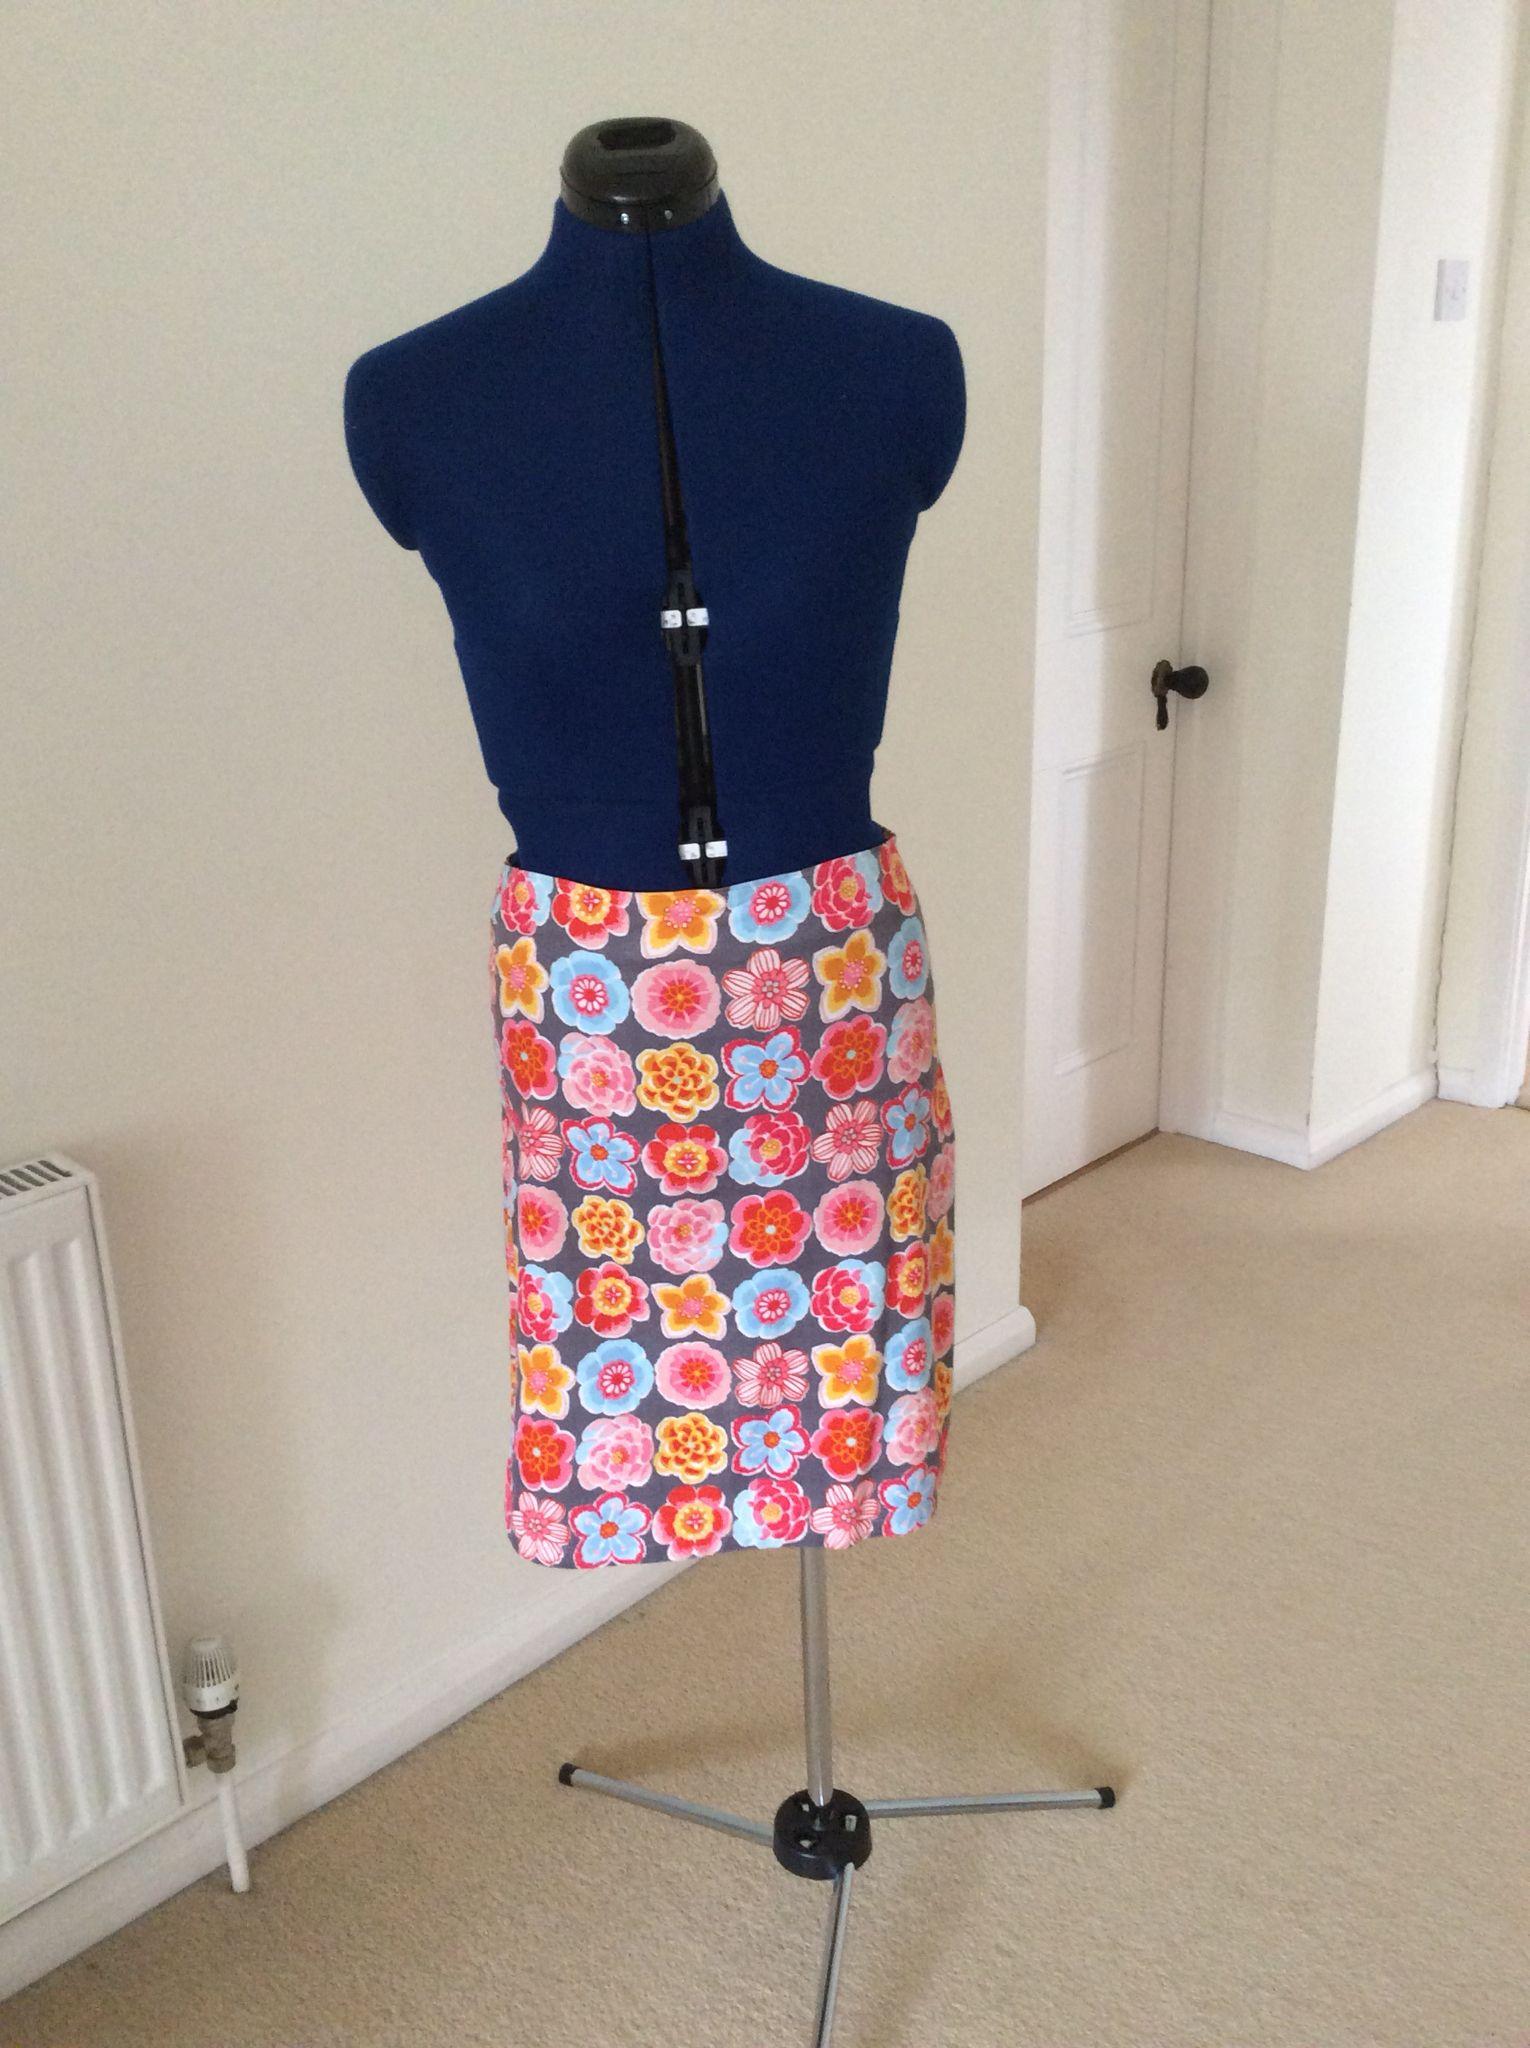 A Line Skirt A Line Skirts Skirts Pencil Skirt